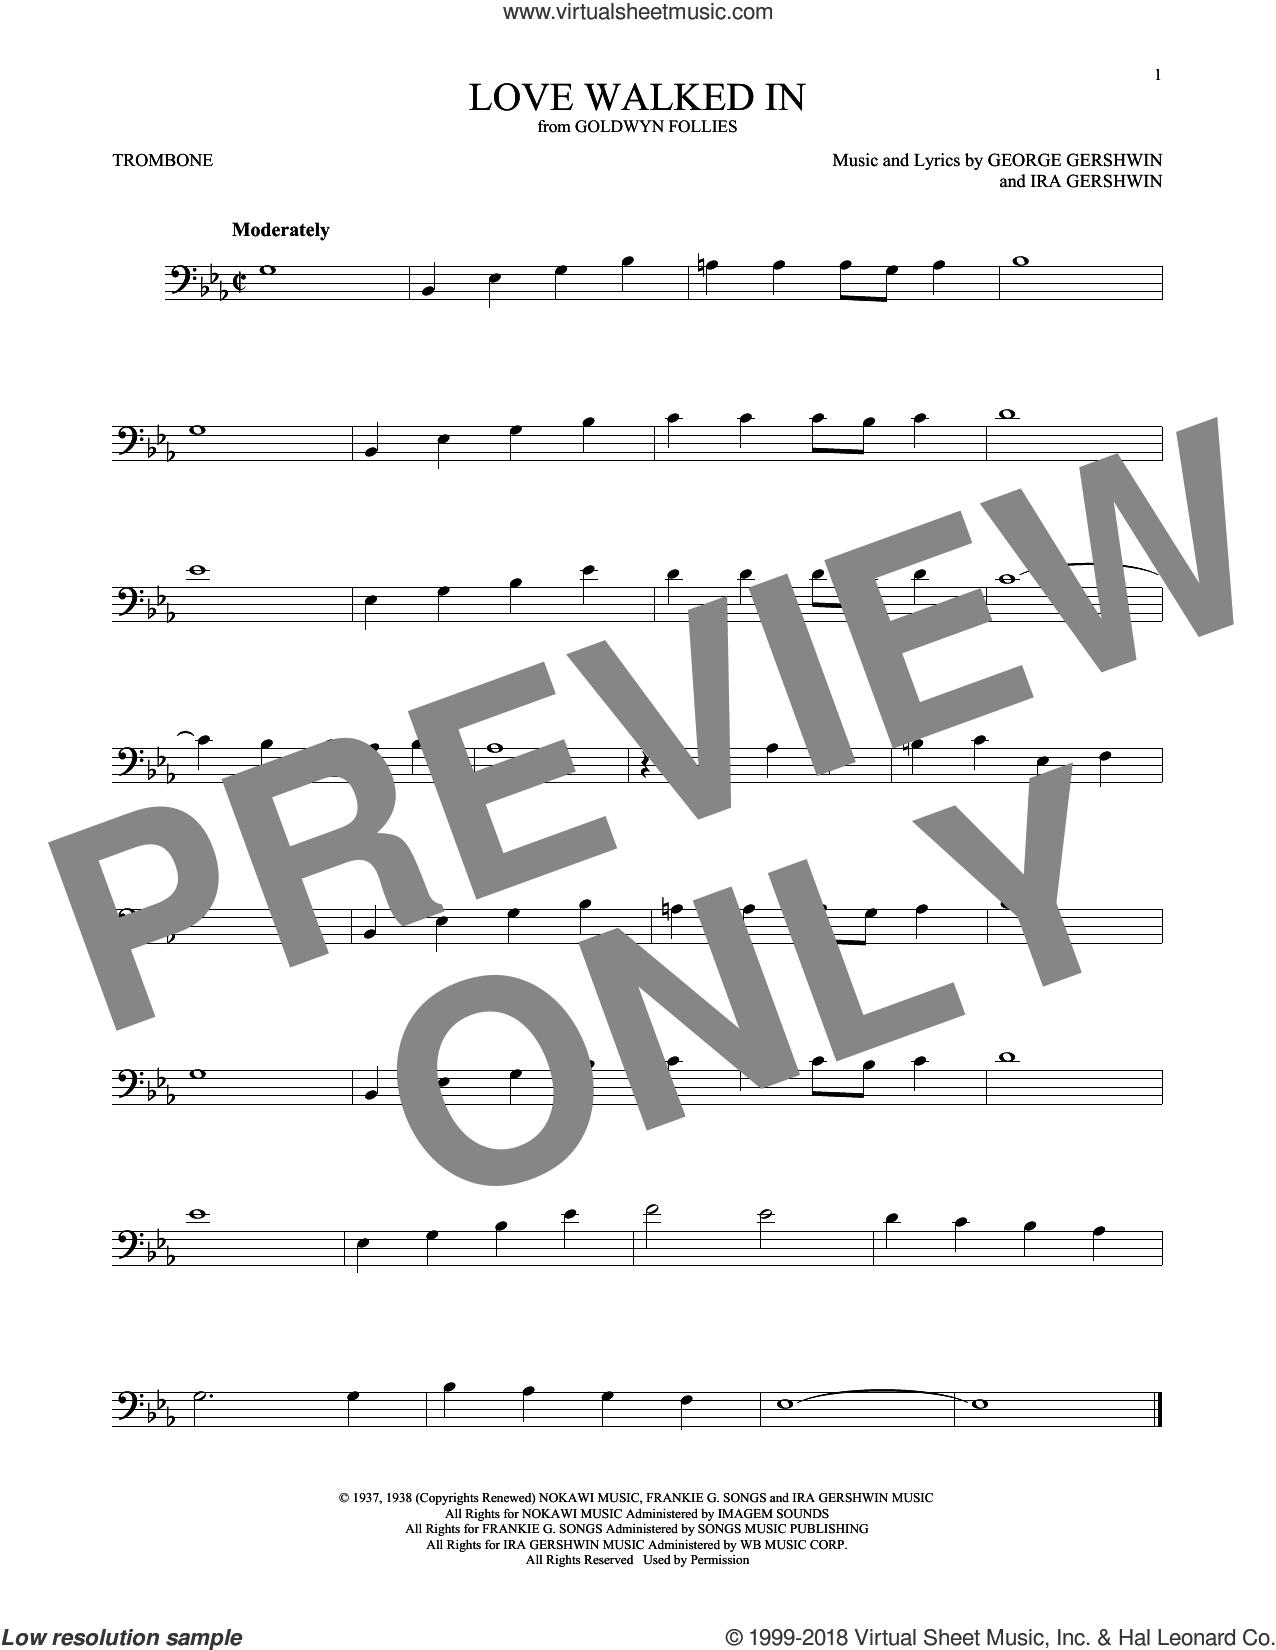 Love Walked In sheet music for trombone solo by George Gershwin and Ira Gershwin, intermediate skill level